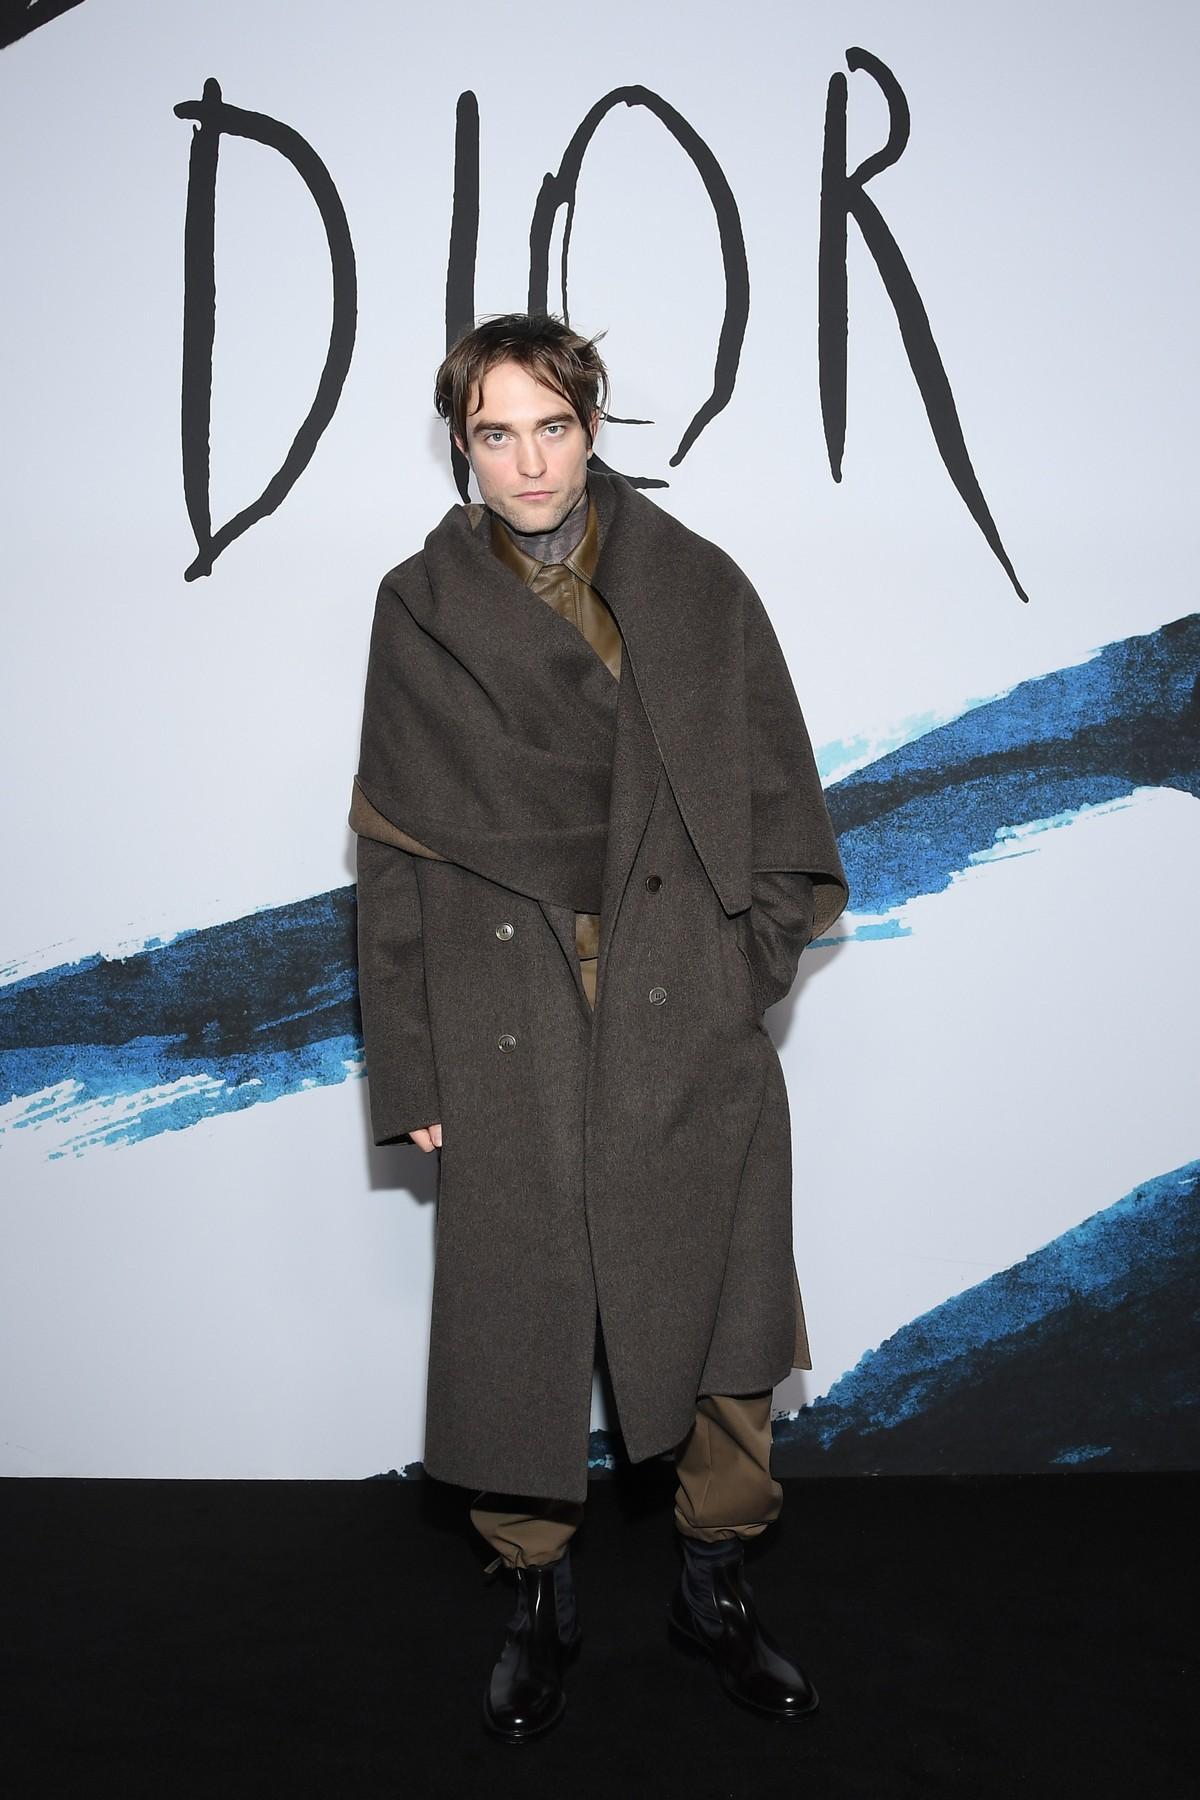 Dior Homme autunno inverno 2019 2020